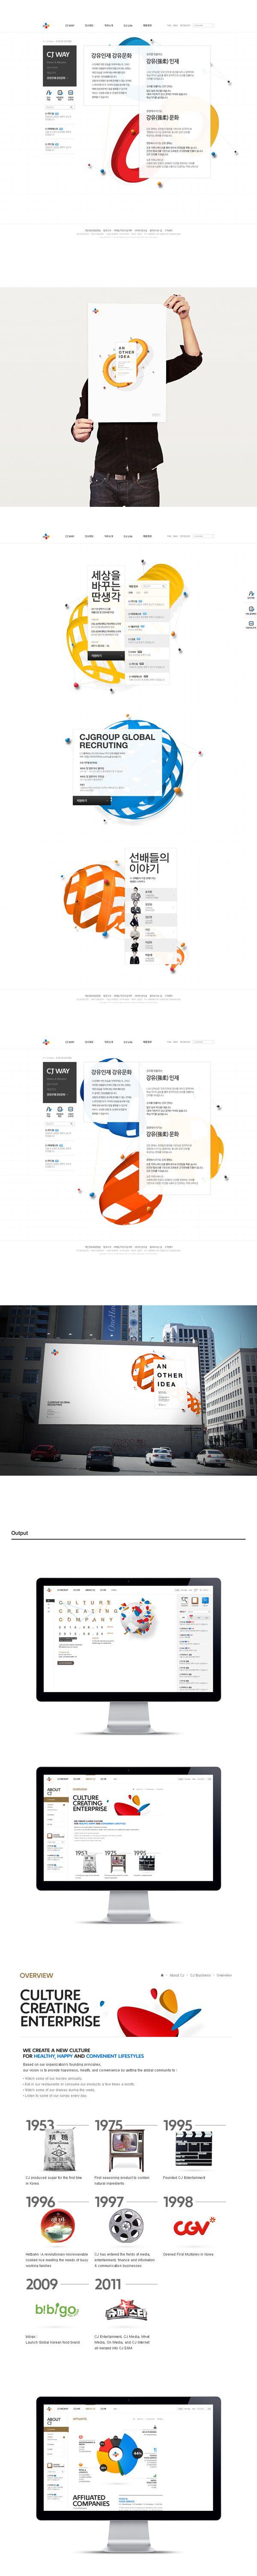 CJ Recruit Website. on Web Design Served